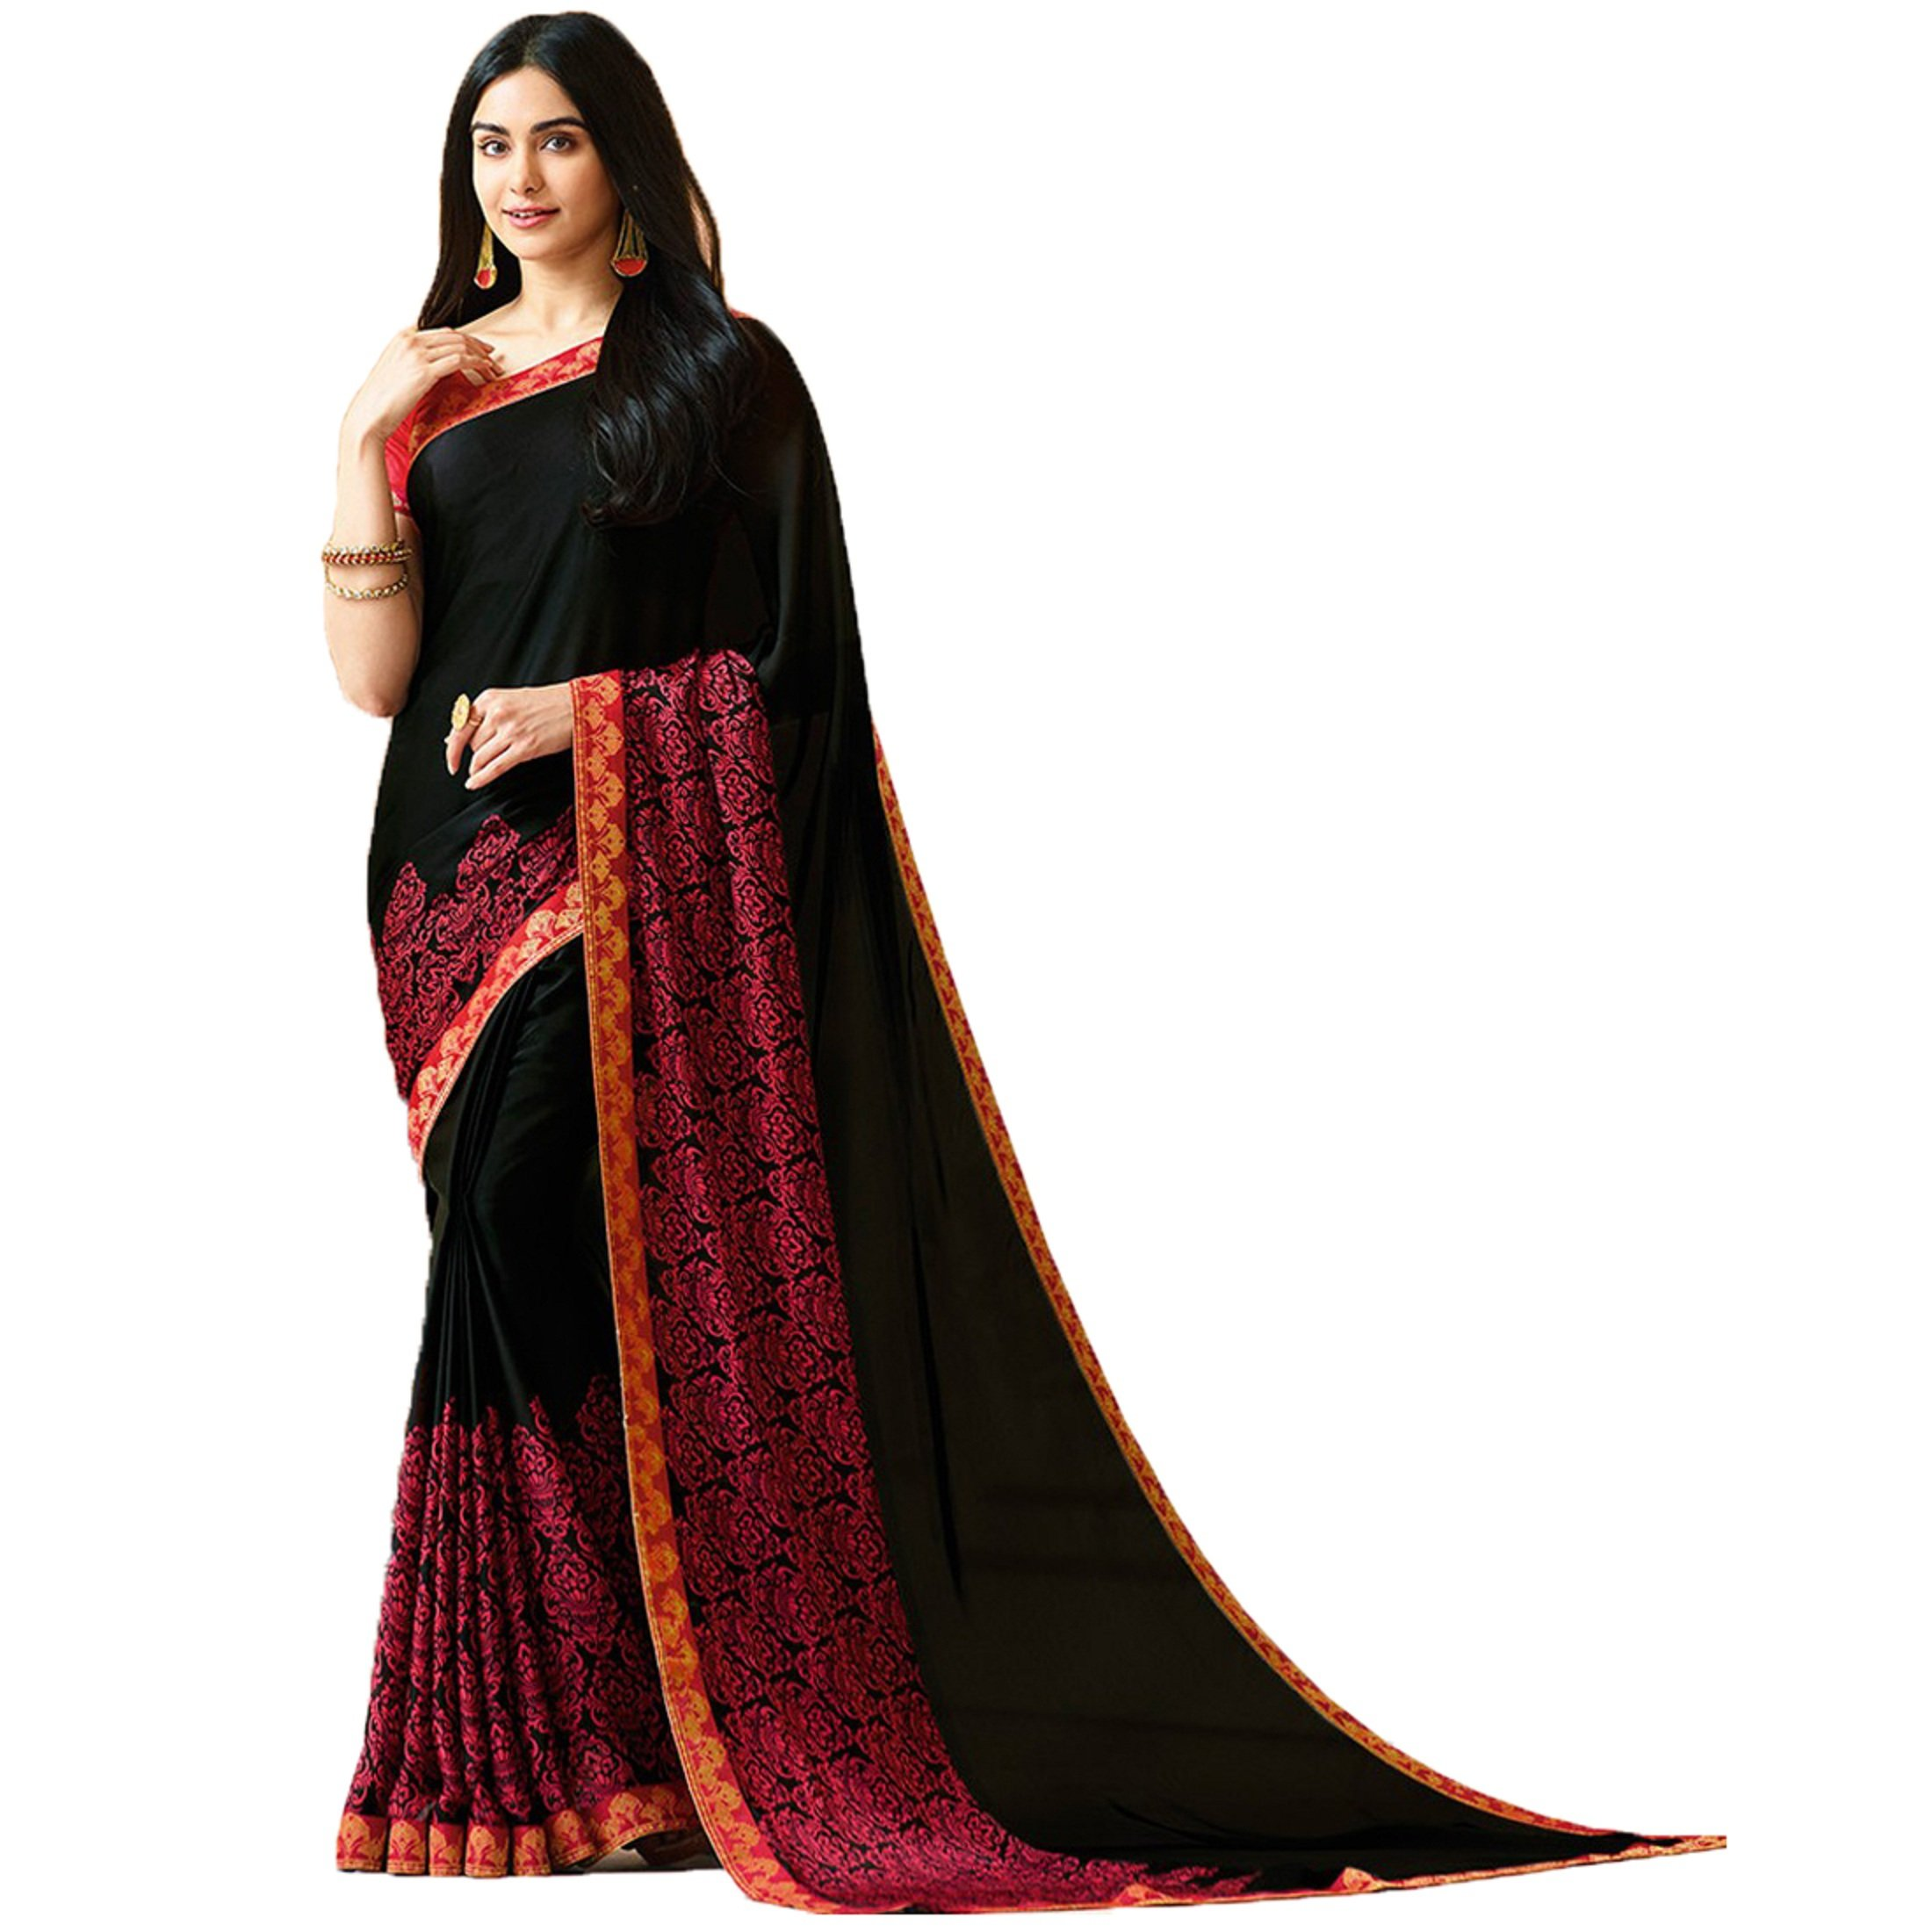 Sari Fashion New Eid Collection Indian/Pakistani Designer Ethnic Simple Look Saree Starwaik 31 (Black)